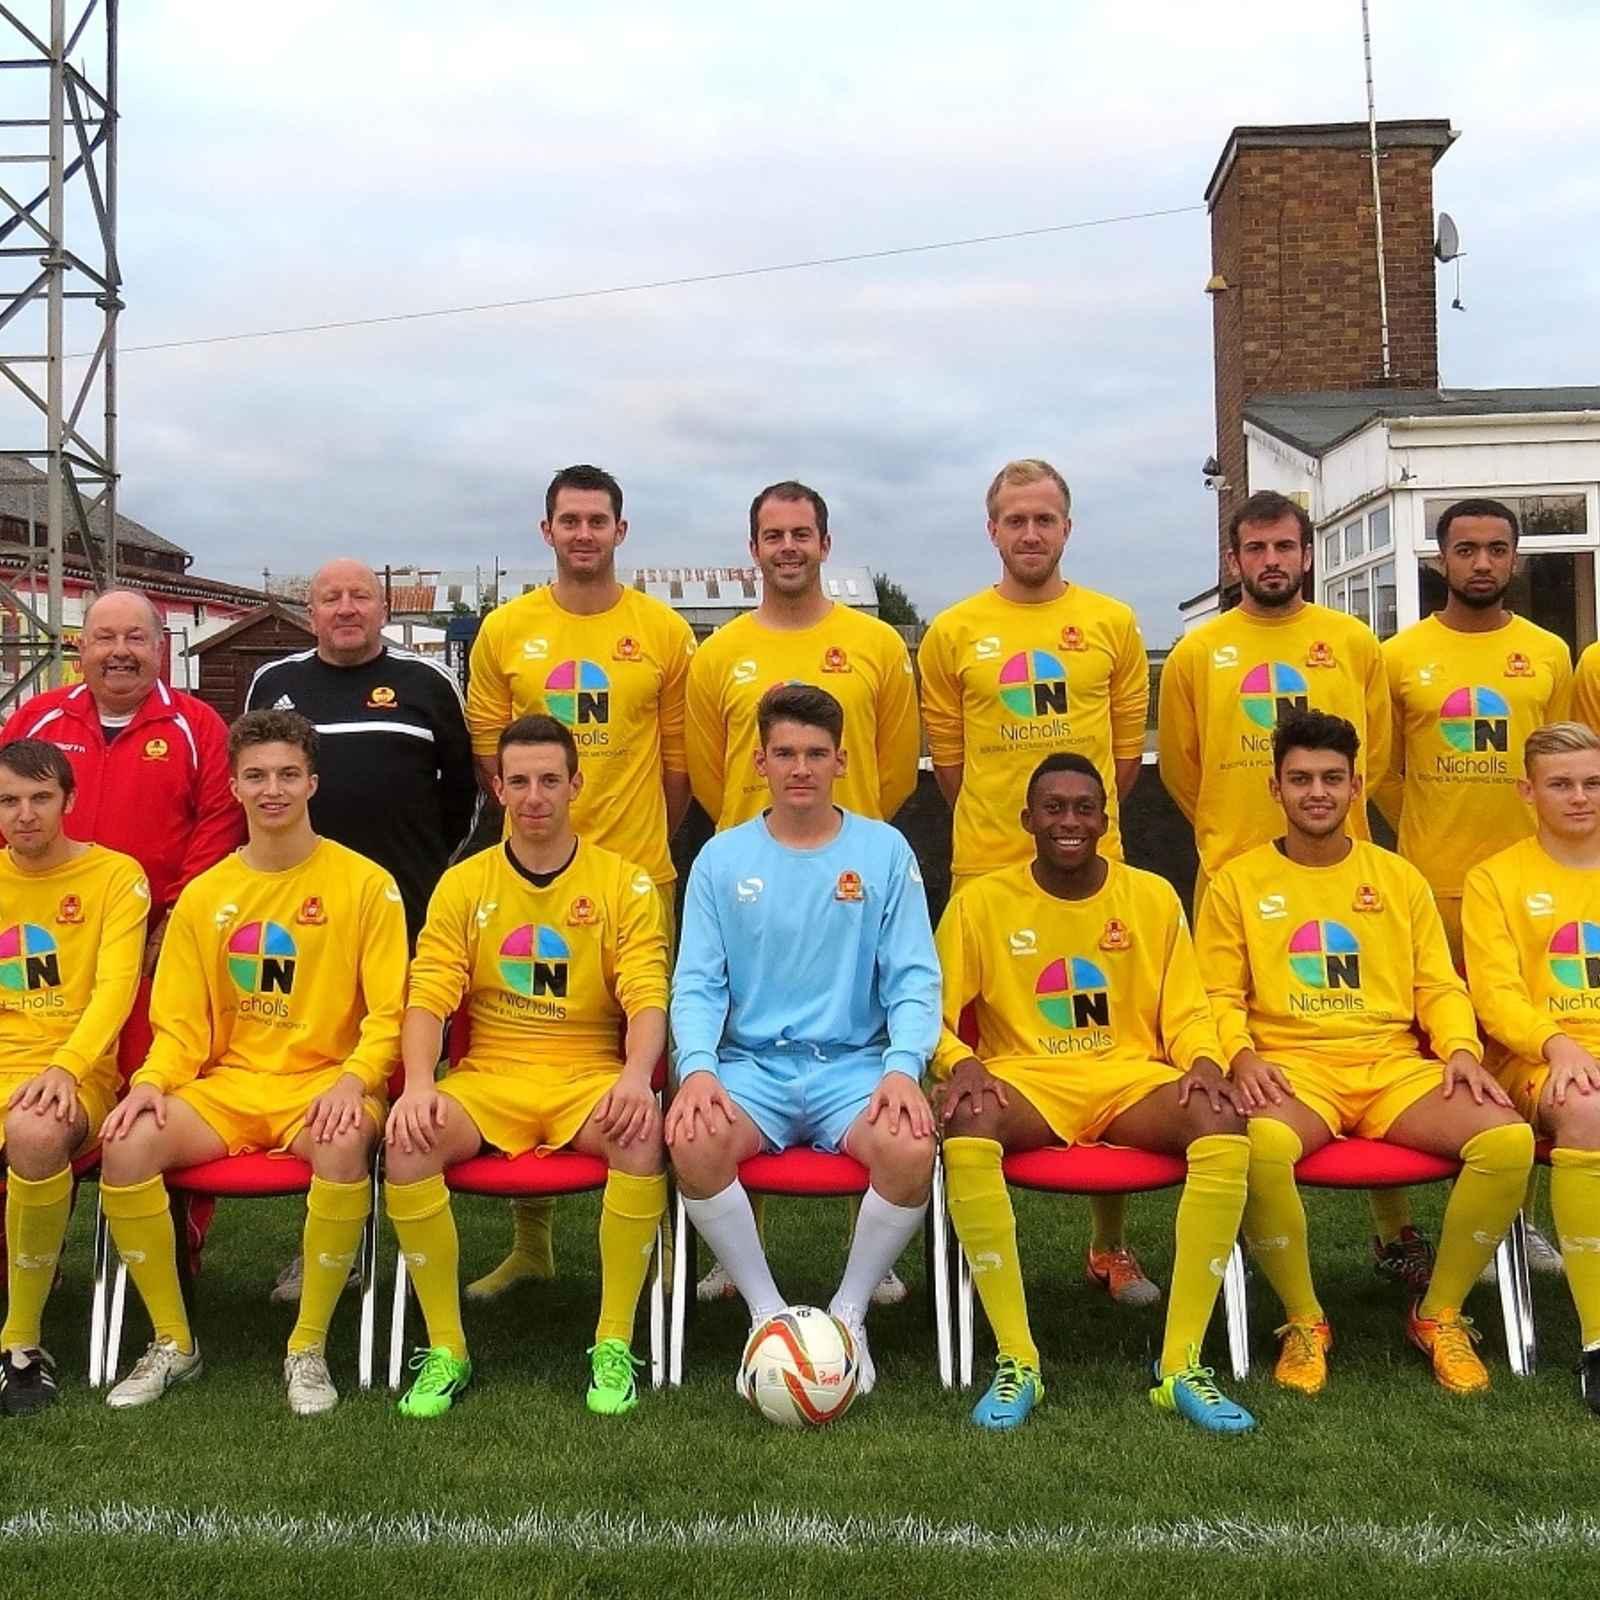 Oxford City 1 Banbury United 0 - Match Report